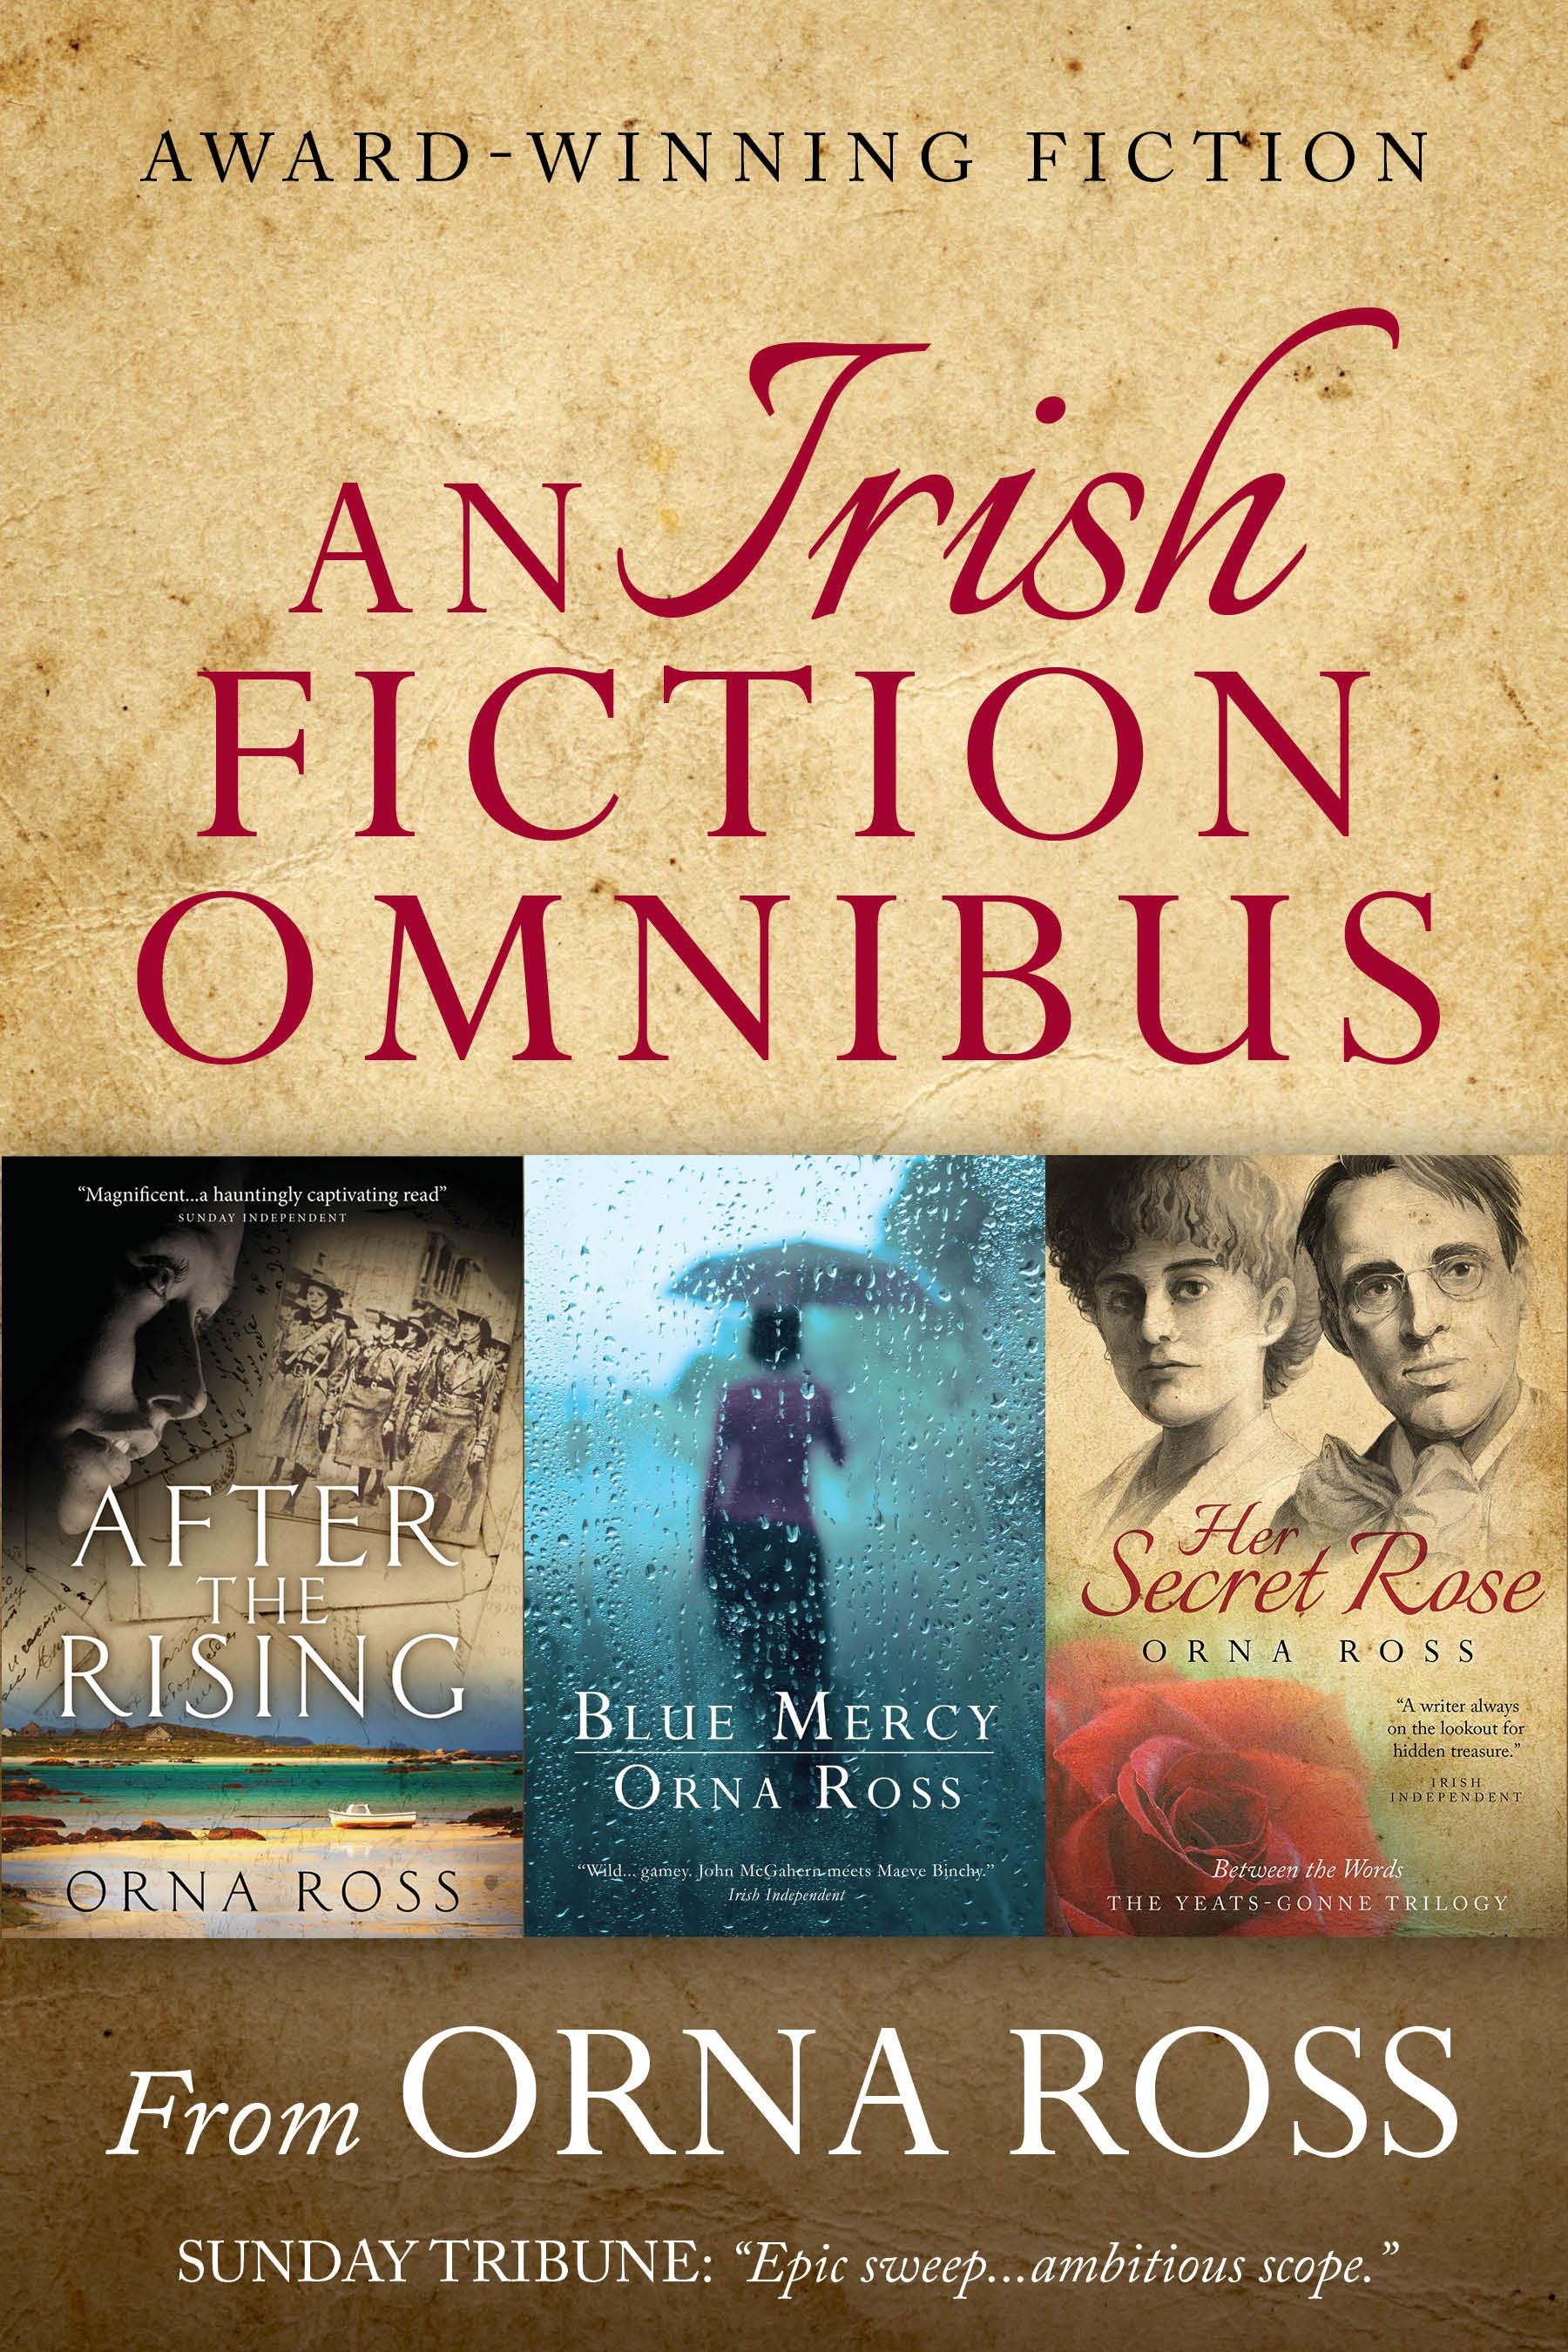 An Irish Fiction Omnibus